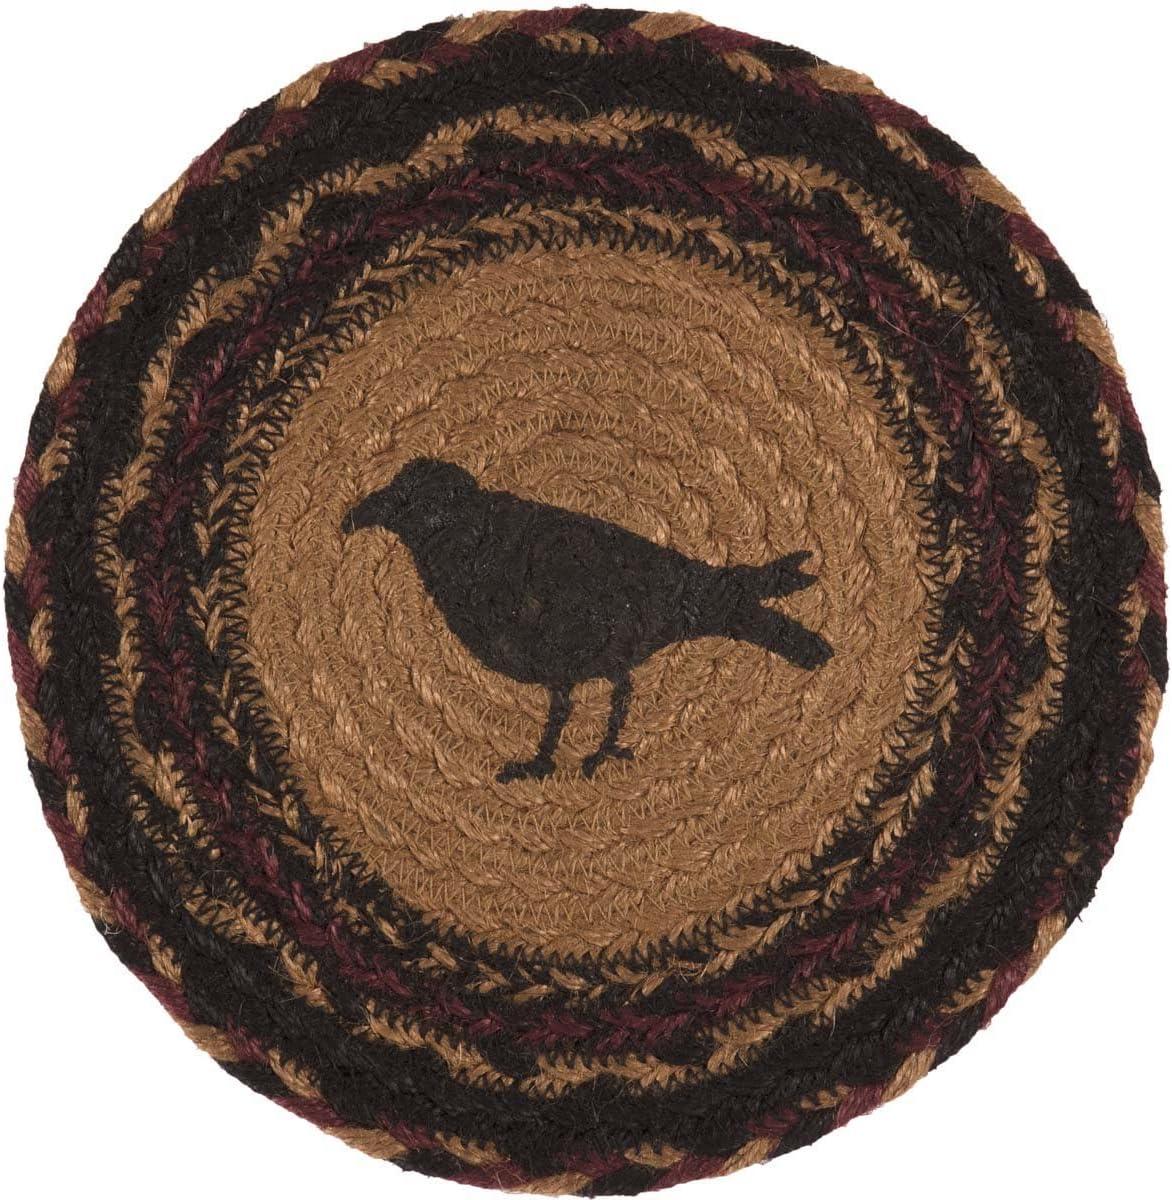 VHC Brands Primitive Tabletop & Kitchen - Heritage Farms Tan Crow Jute Trivet